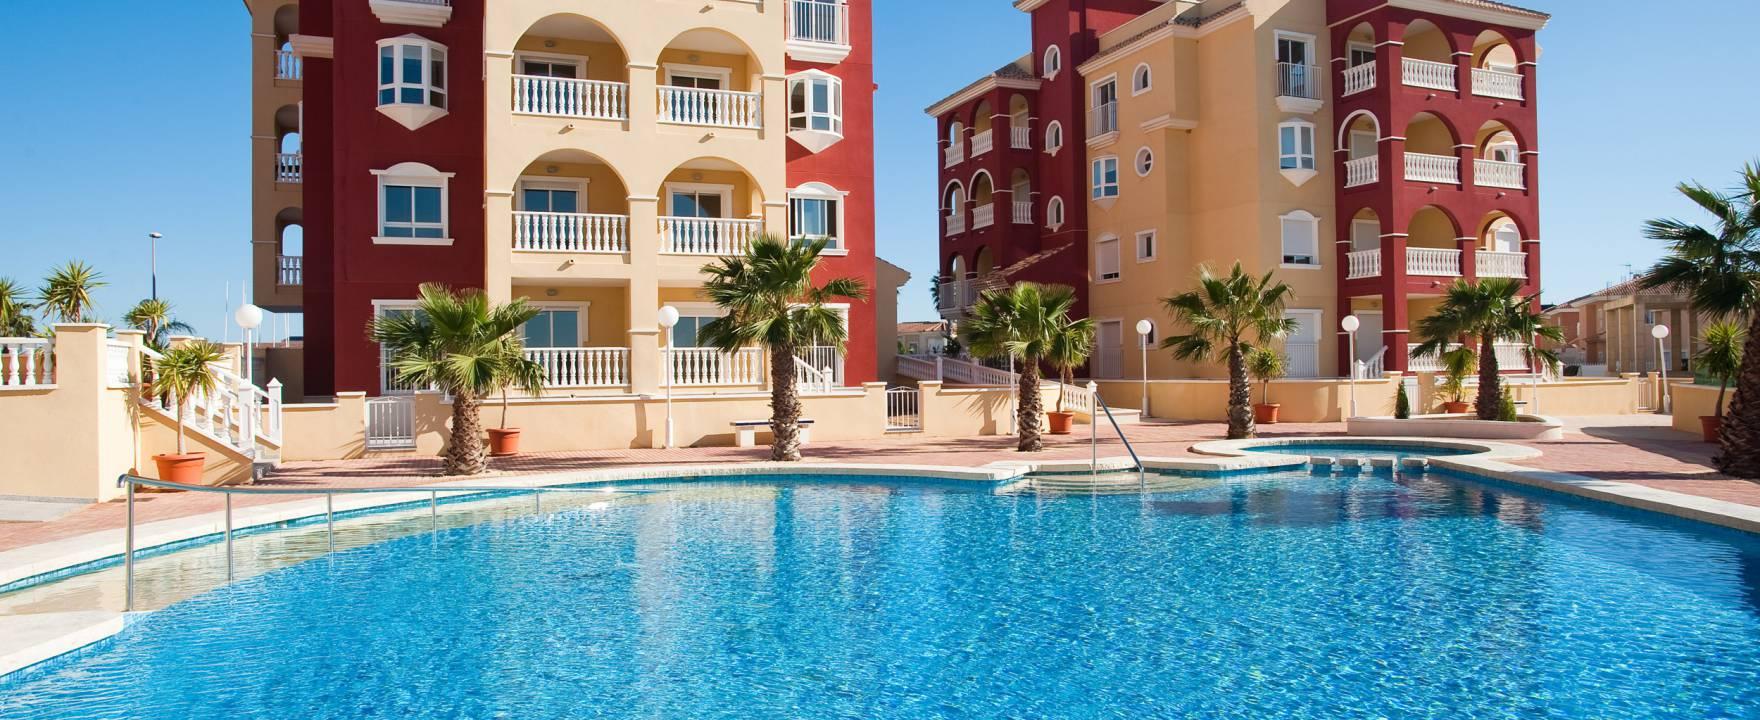 Nye innflyttingsklare leiligheter i Los Alcázares – gangavstand til stranden!